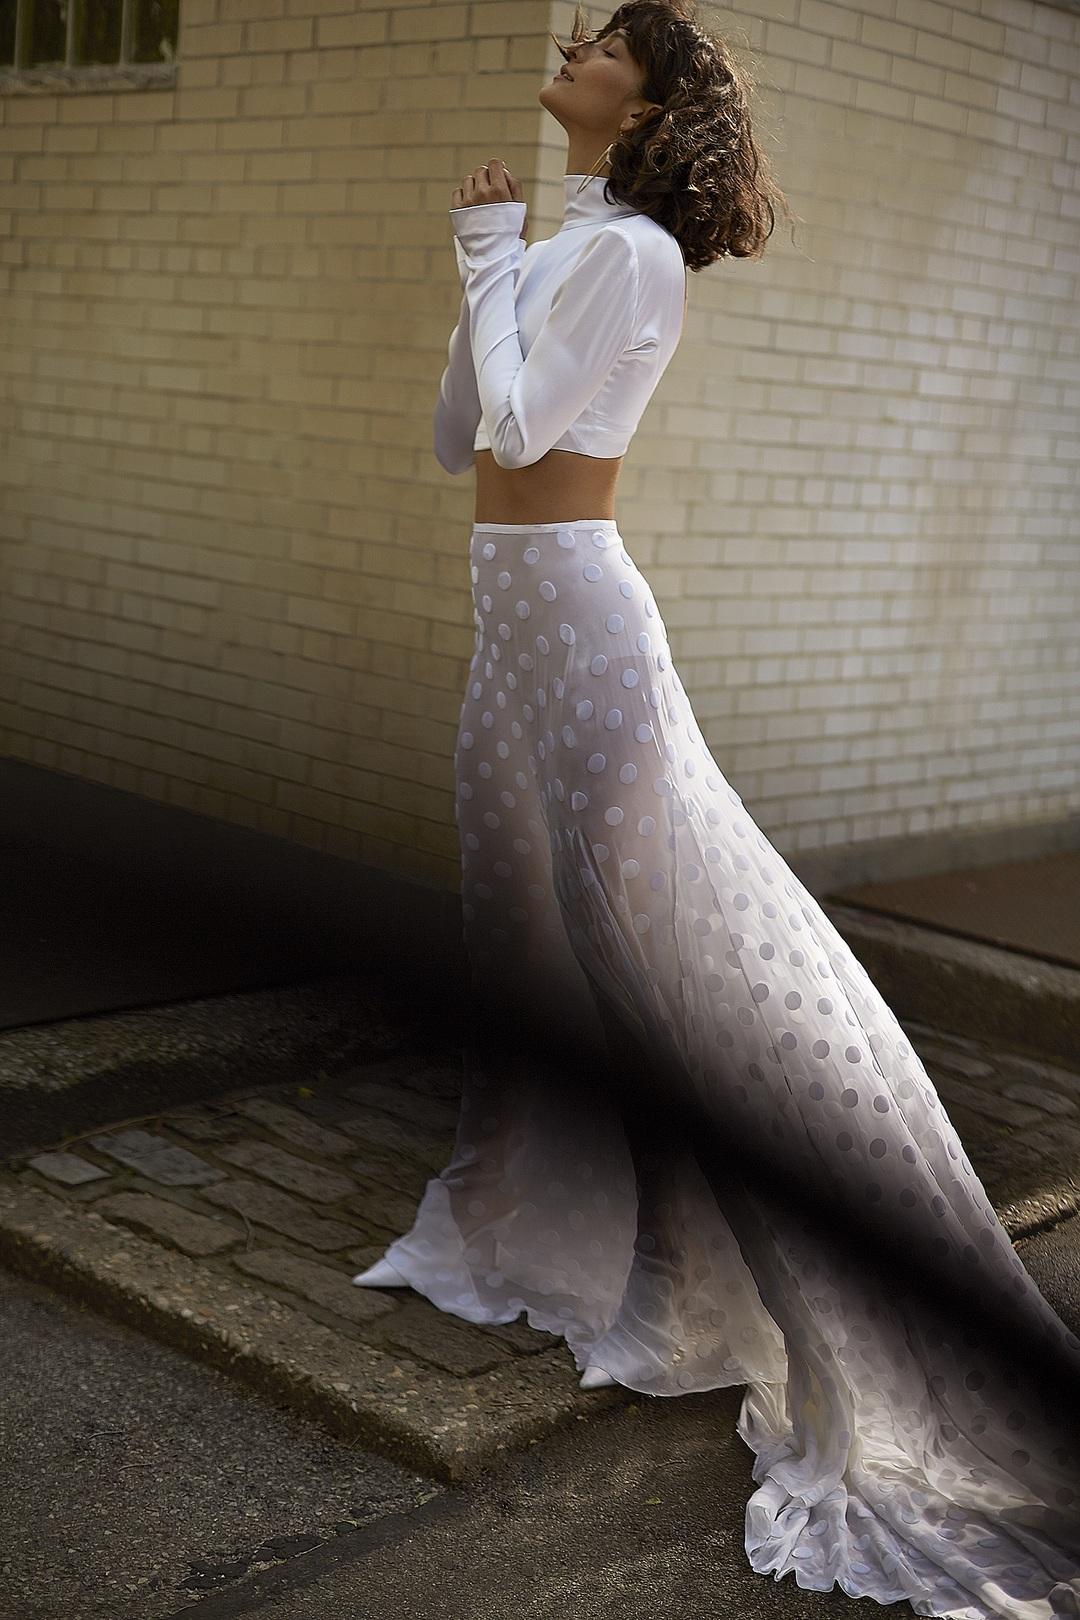 mia top  dress photo